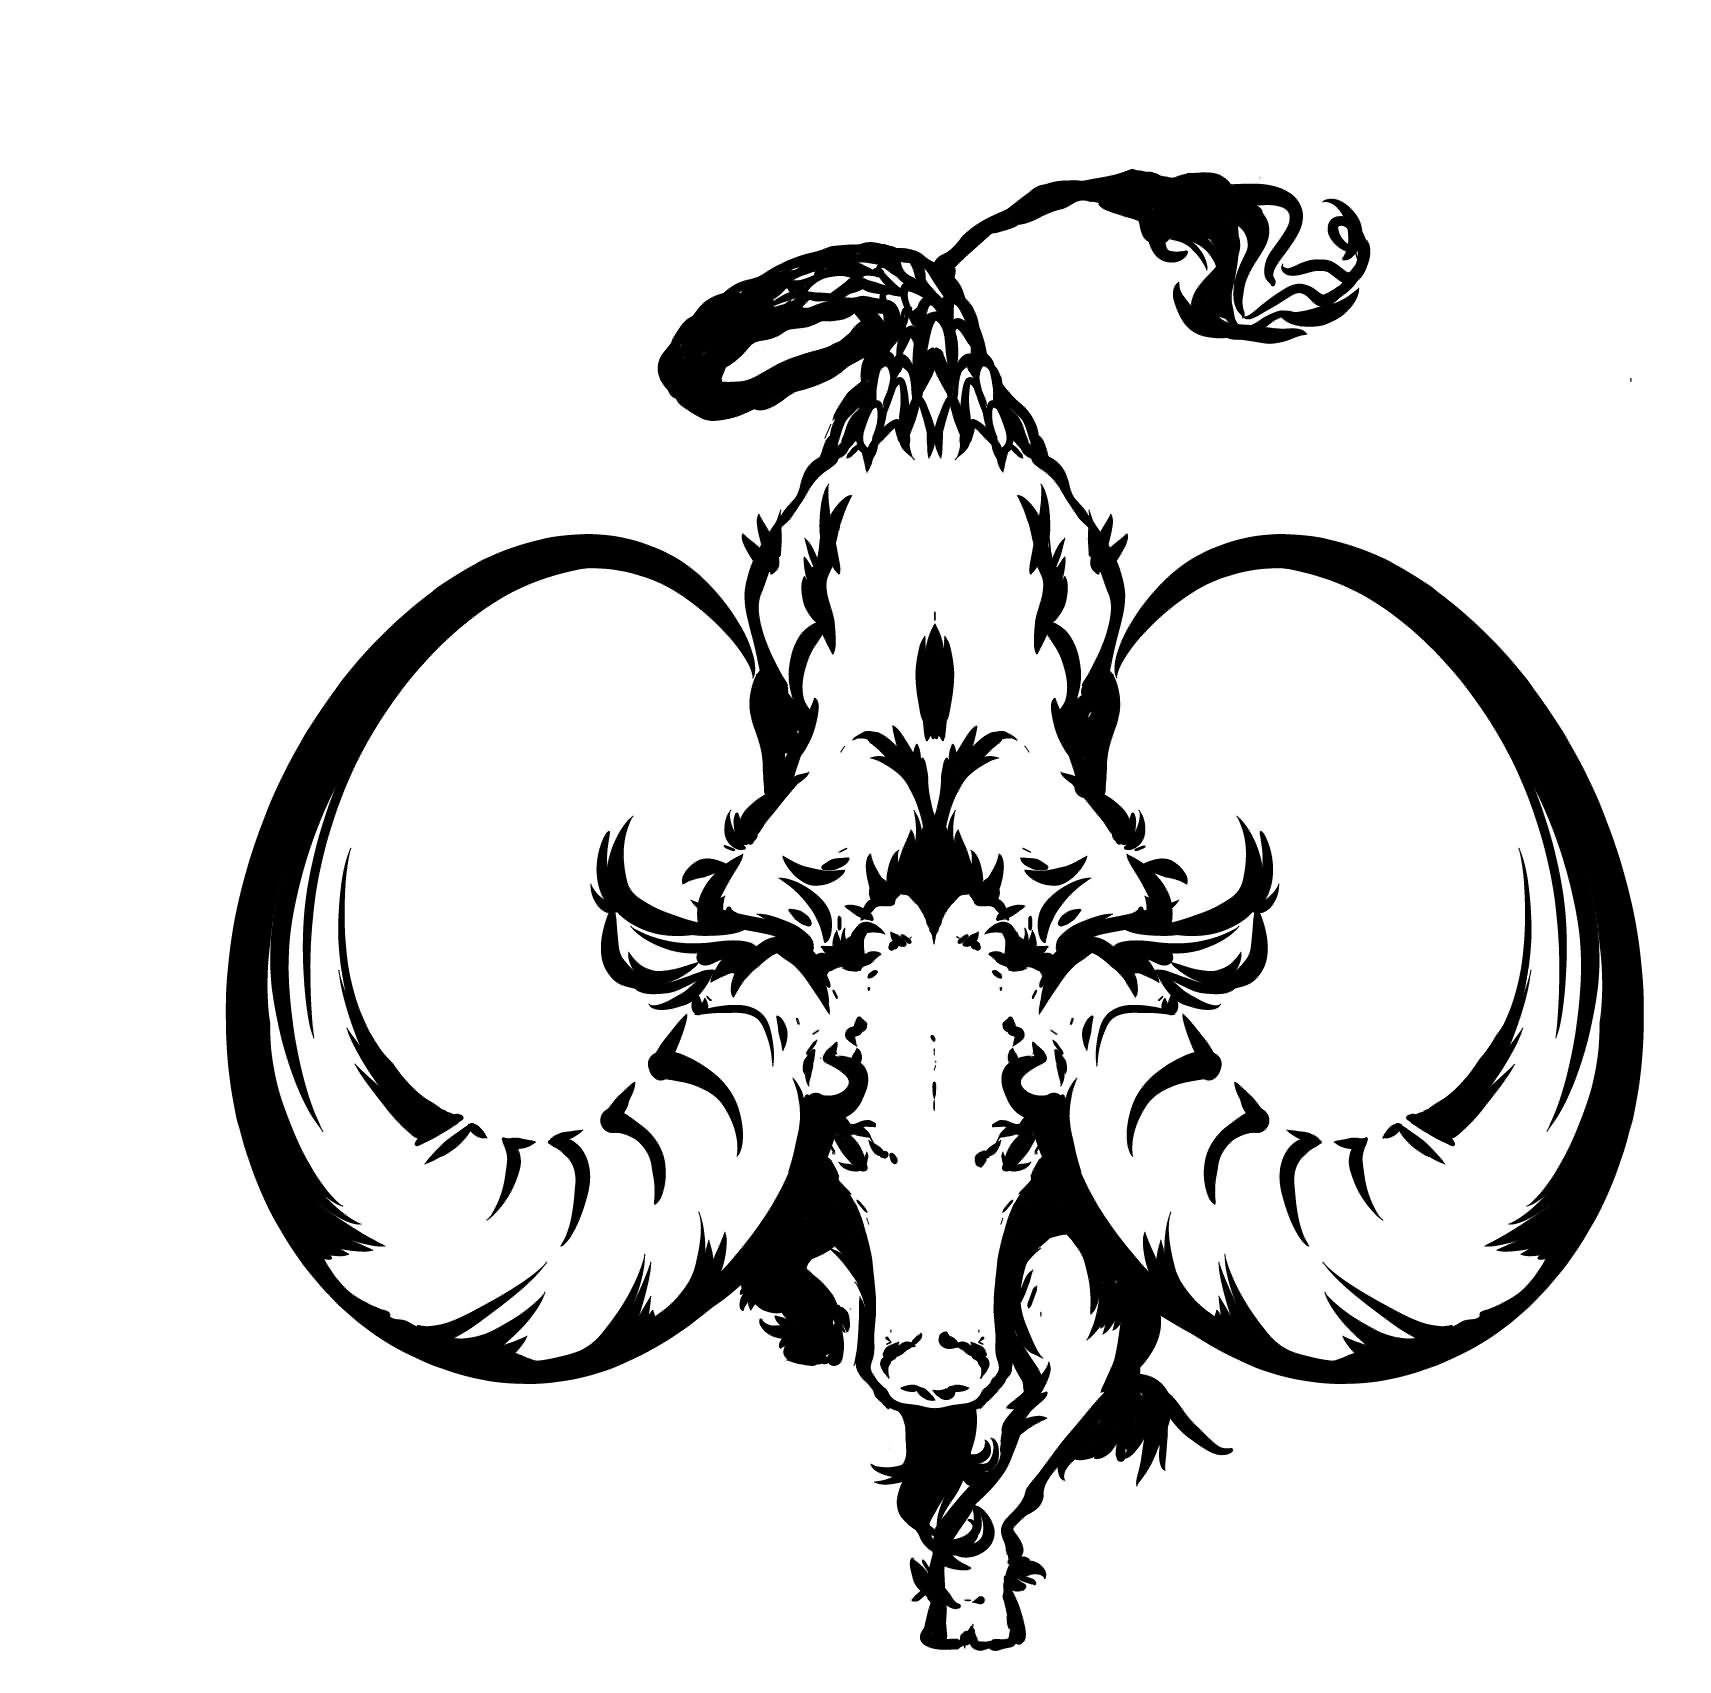 Sign tattoo designs - Black And White Capricorn Tattoo Design